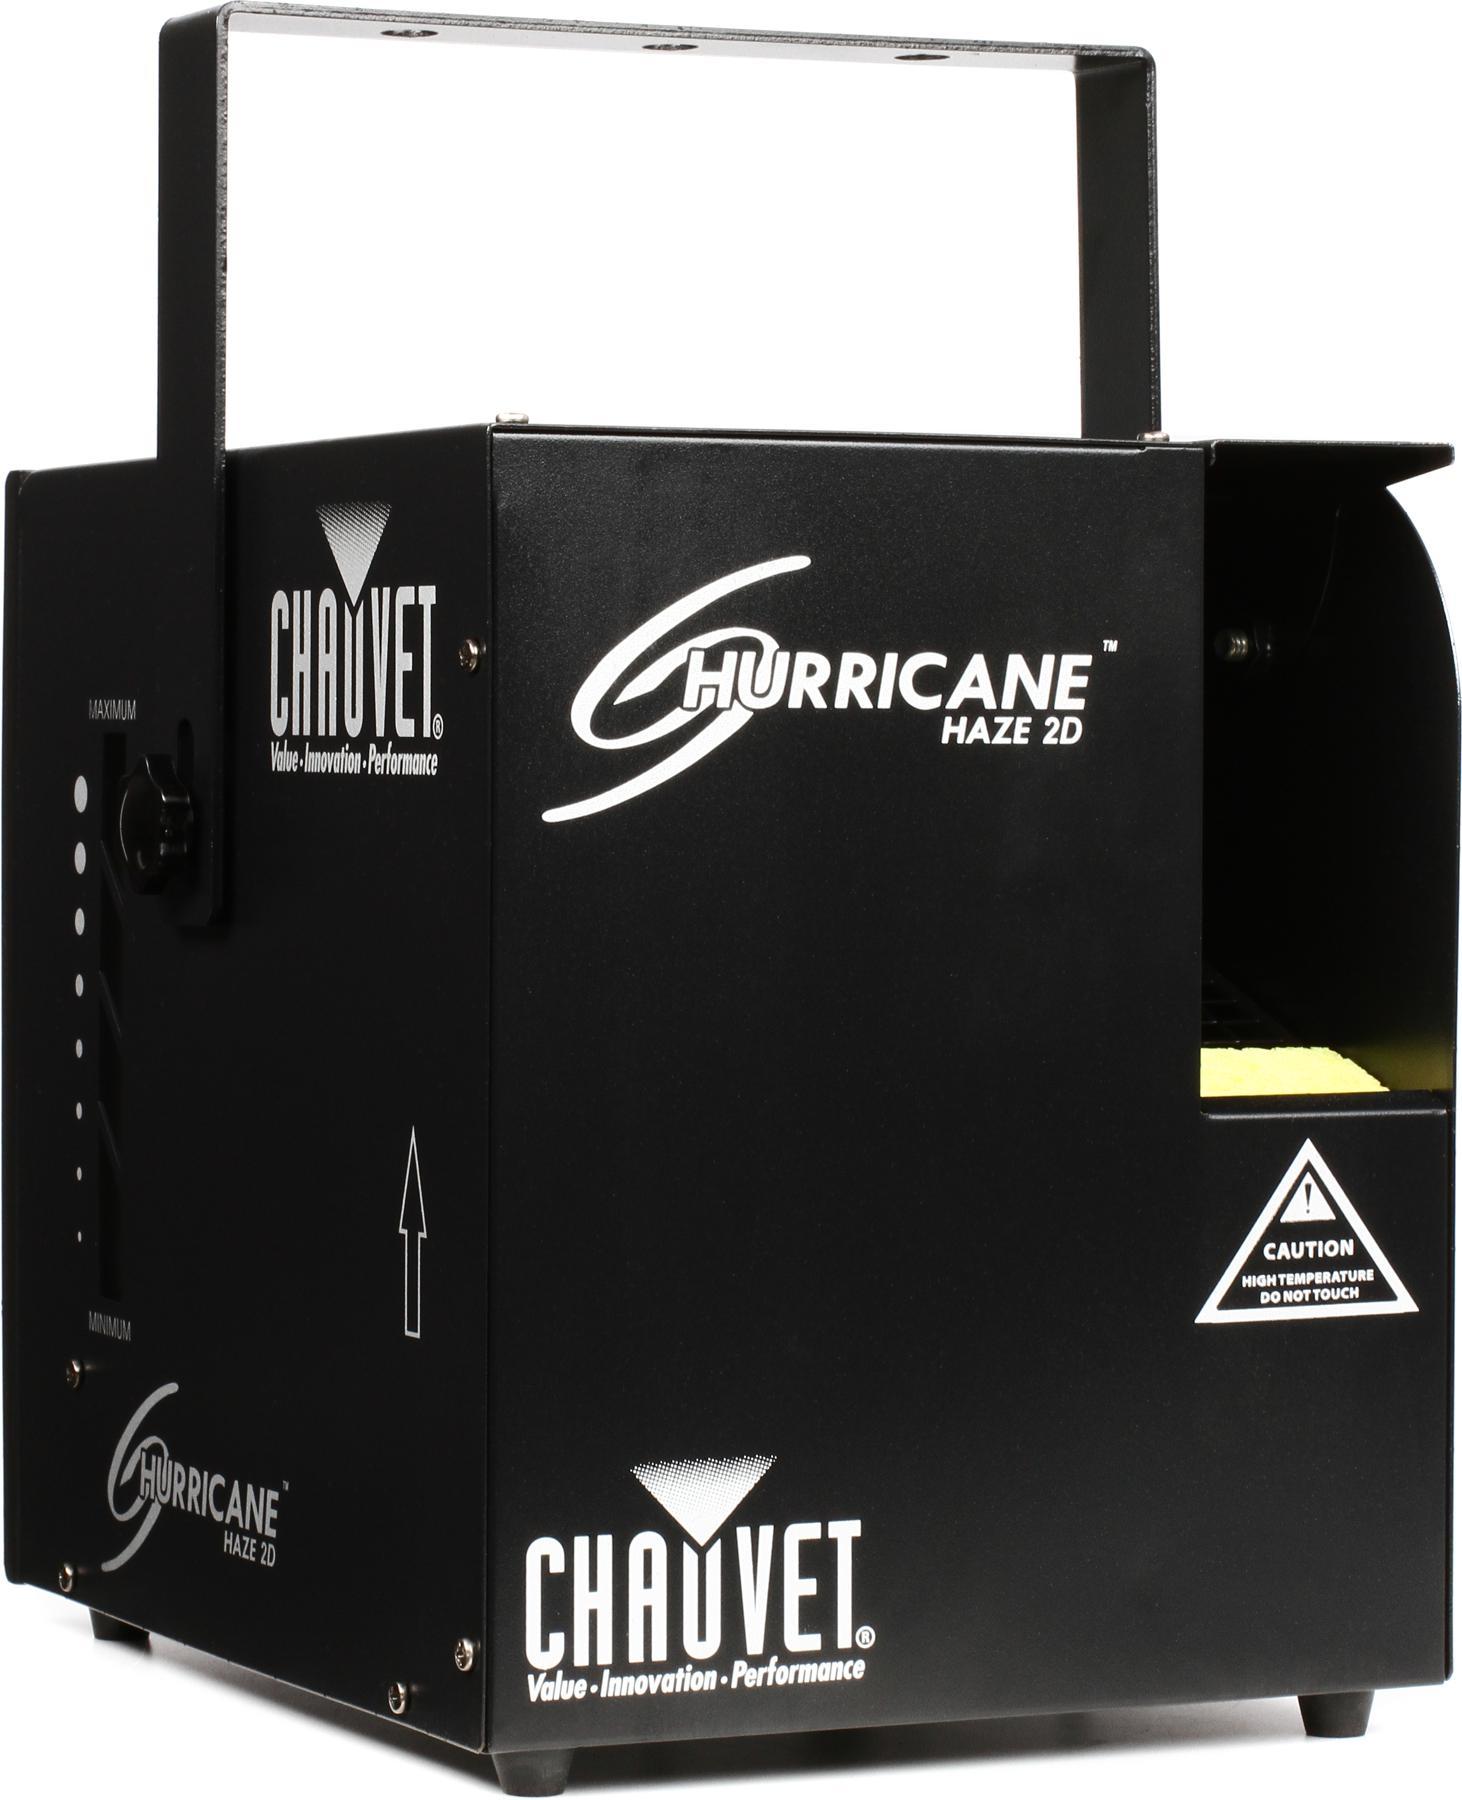 3. Chauvet DJ Hurricane Haze 2D DMX